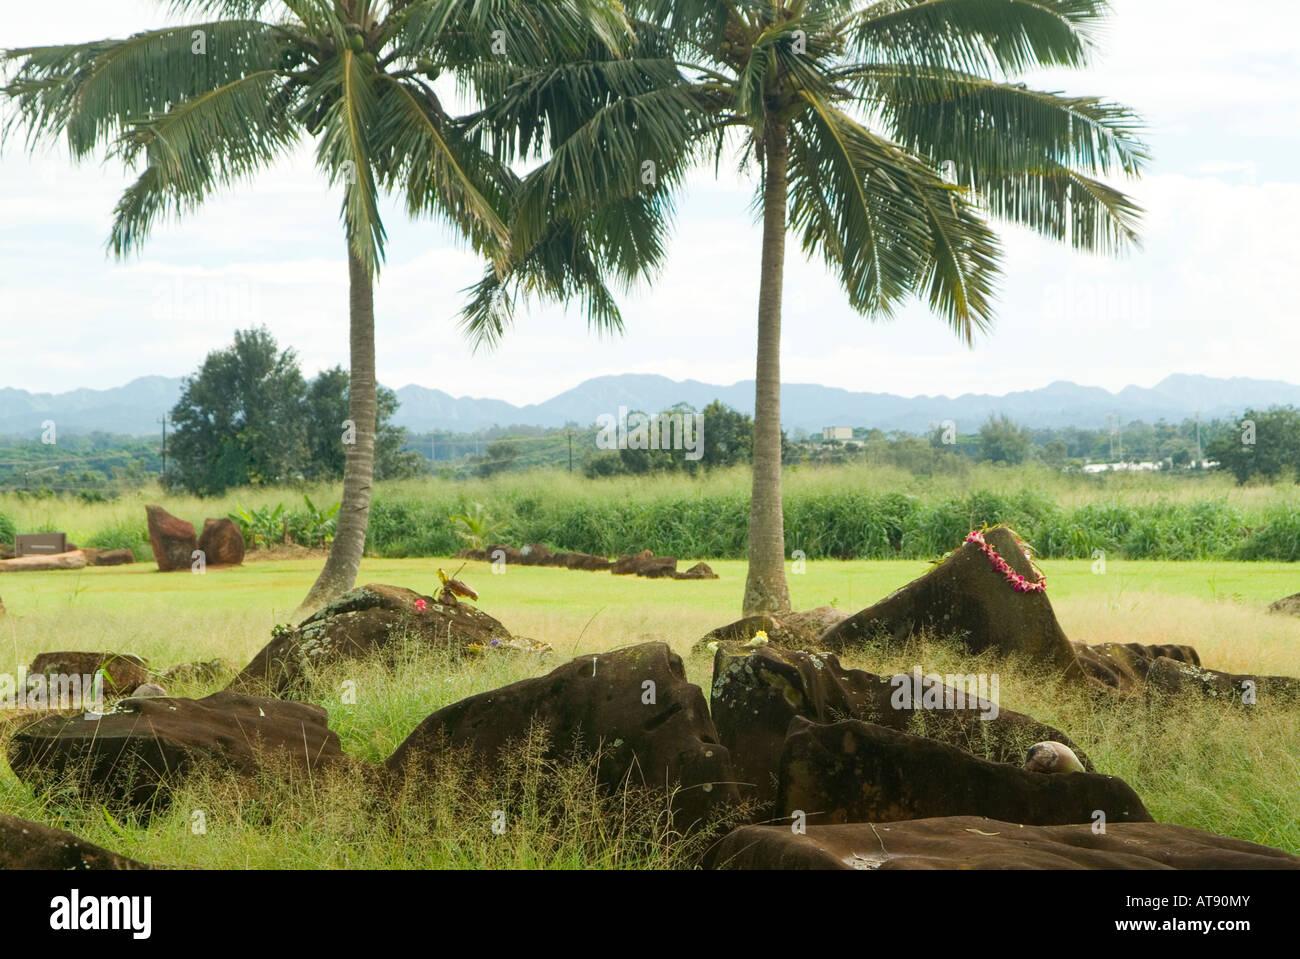 Estado Kukaniloko monumento histórico (piedras) de parto real en Wahiawa, Oahu. Foto de stock